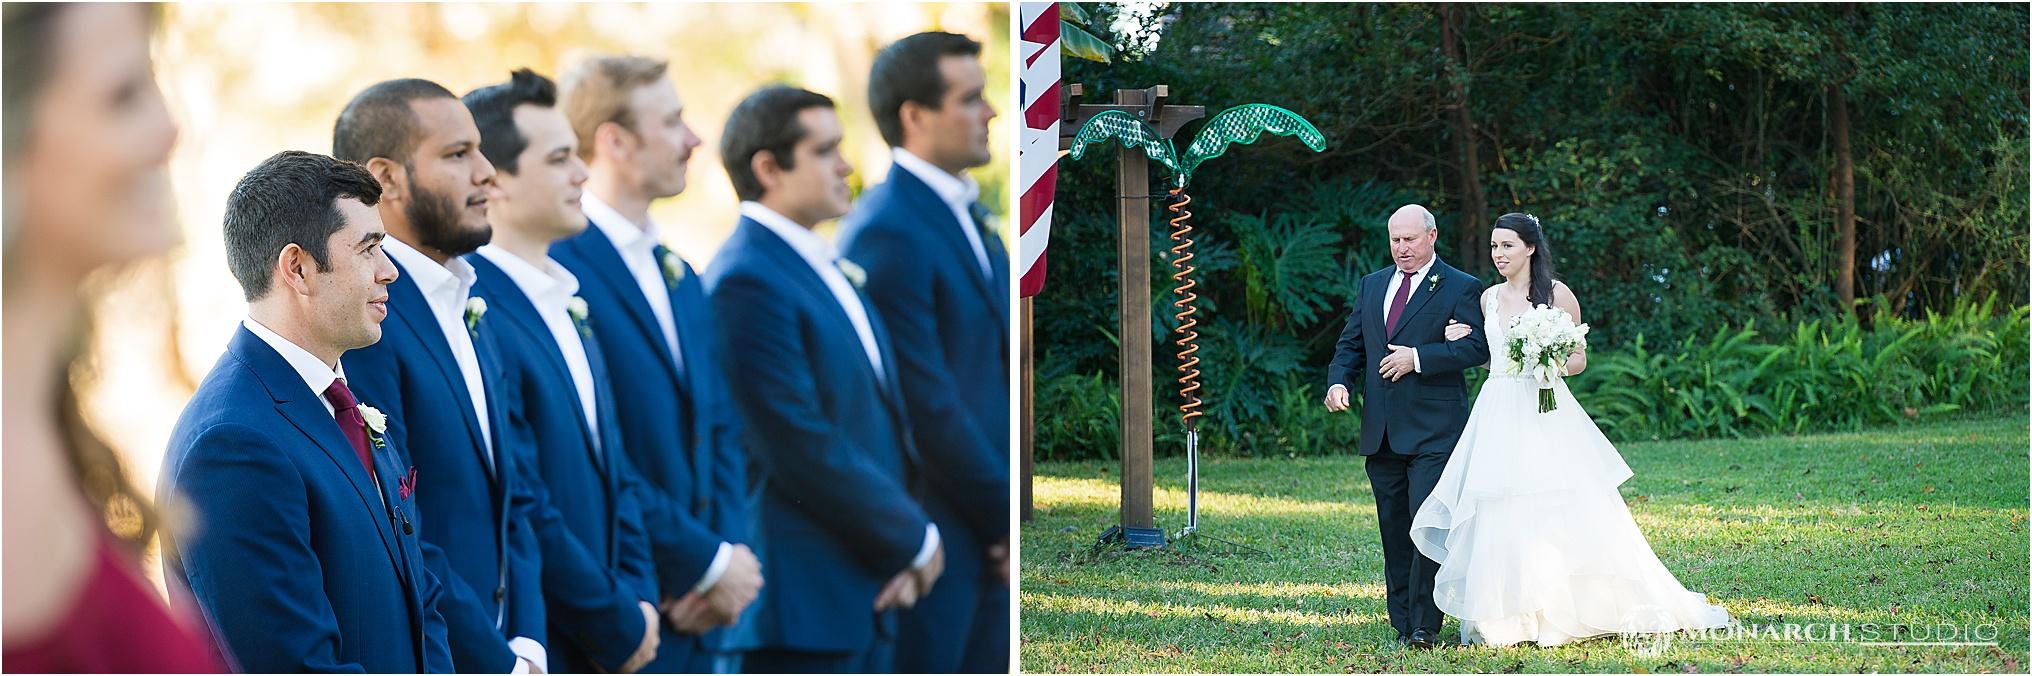 Wedding-photographer-in-sanford-florida-natural-wedding-035.jpg